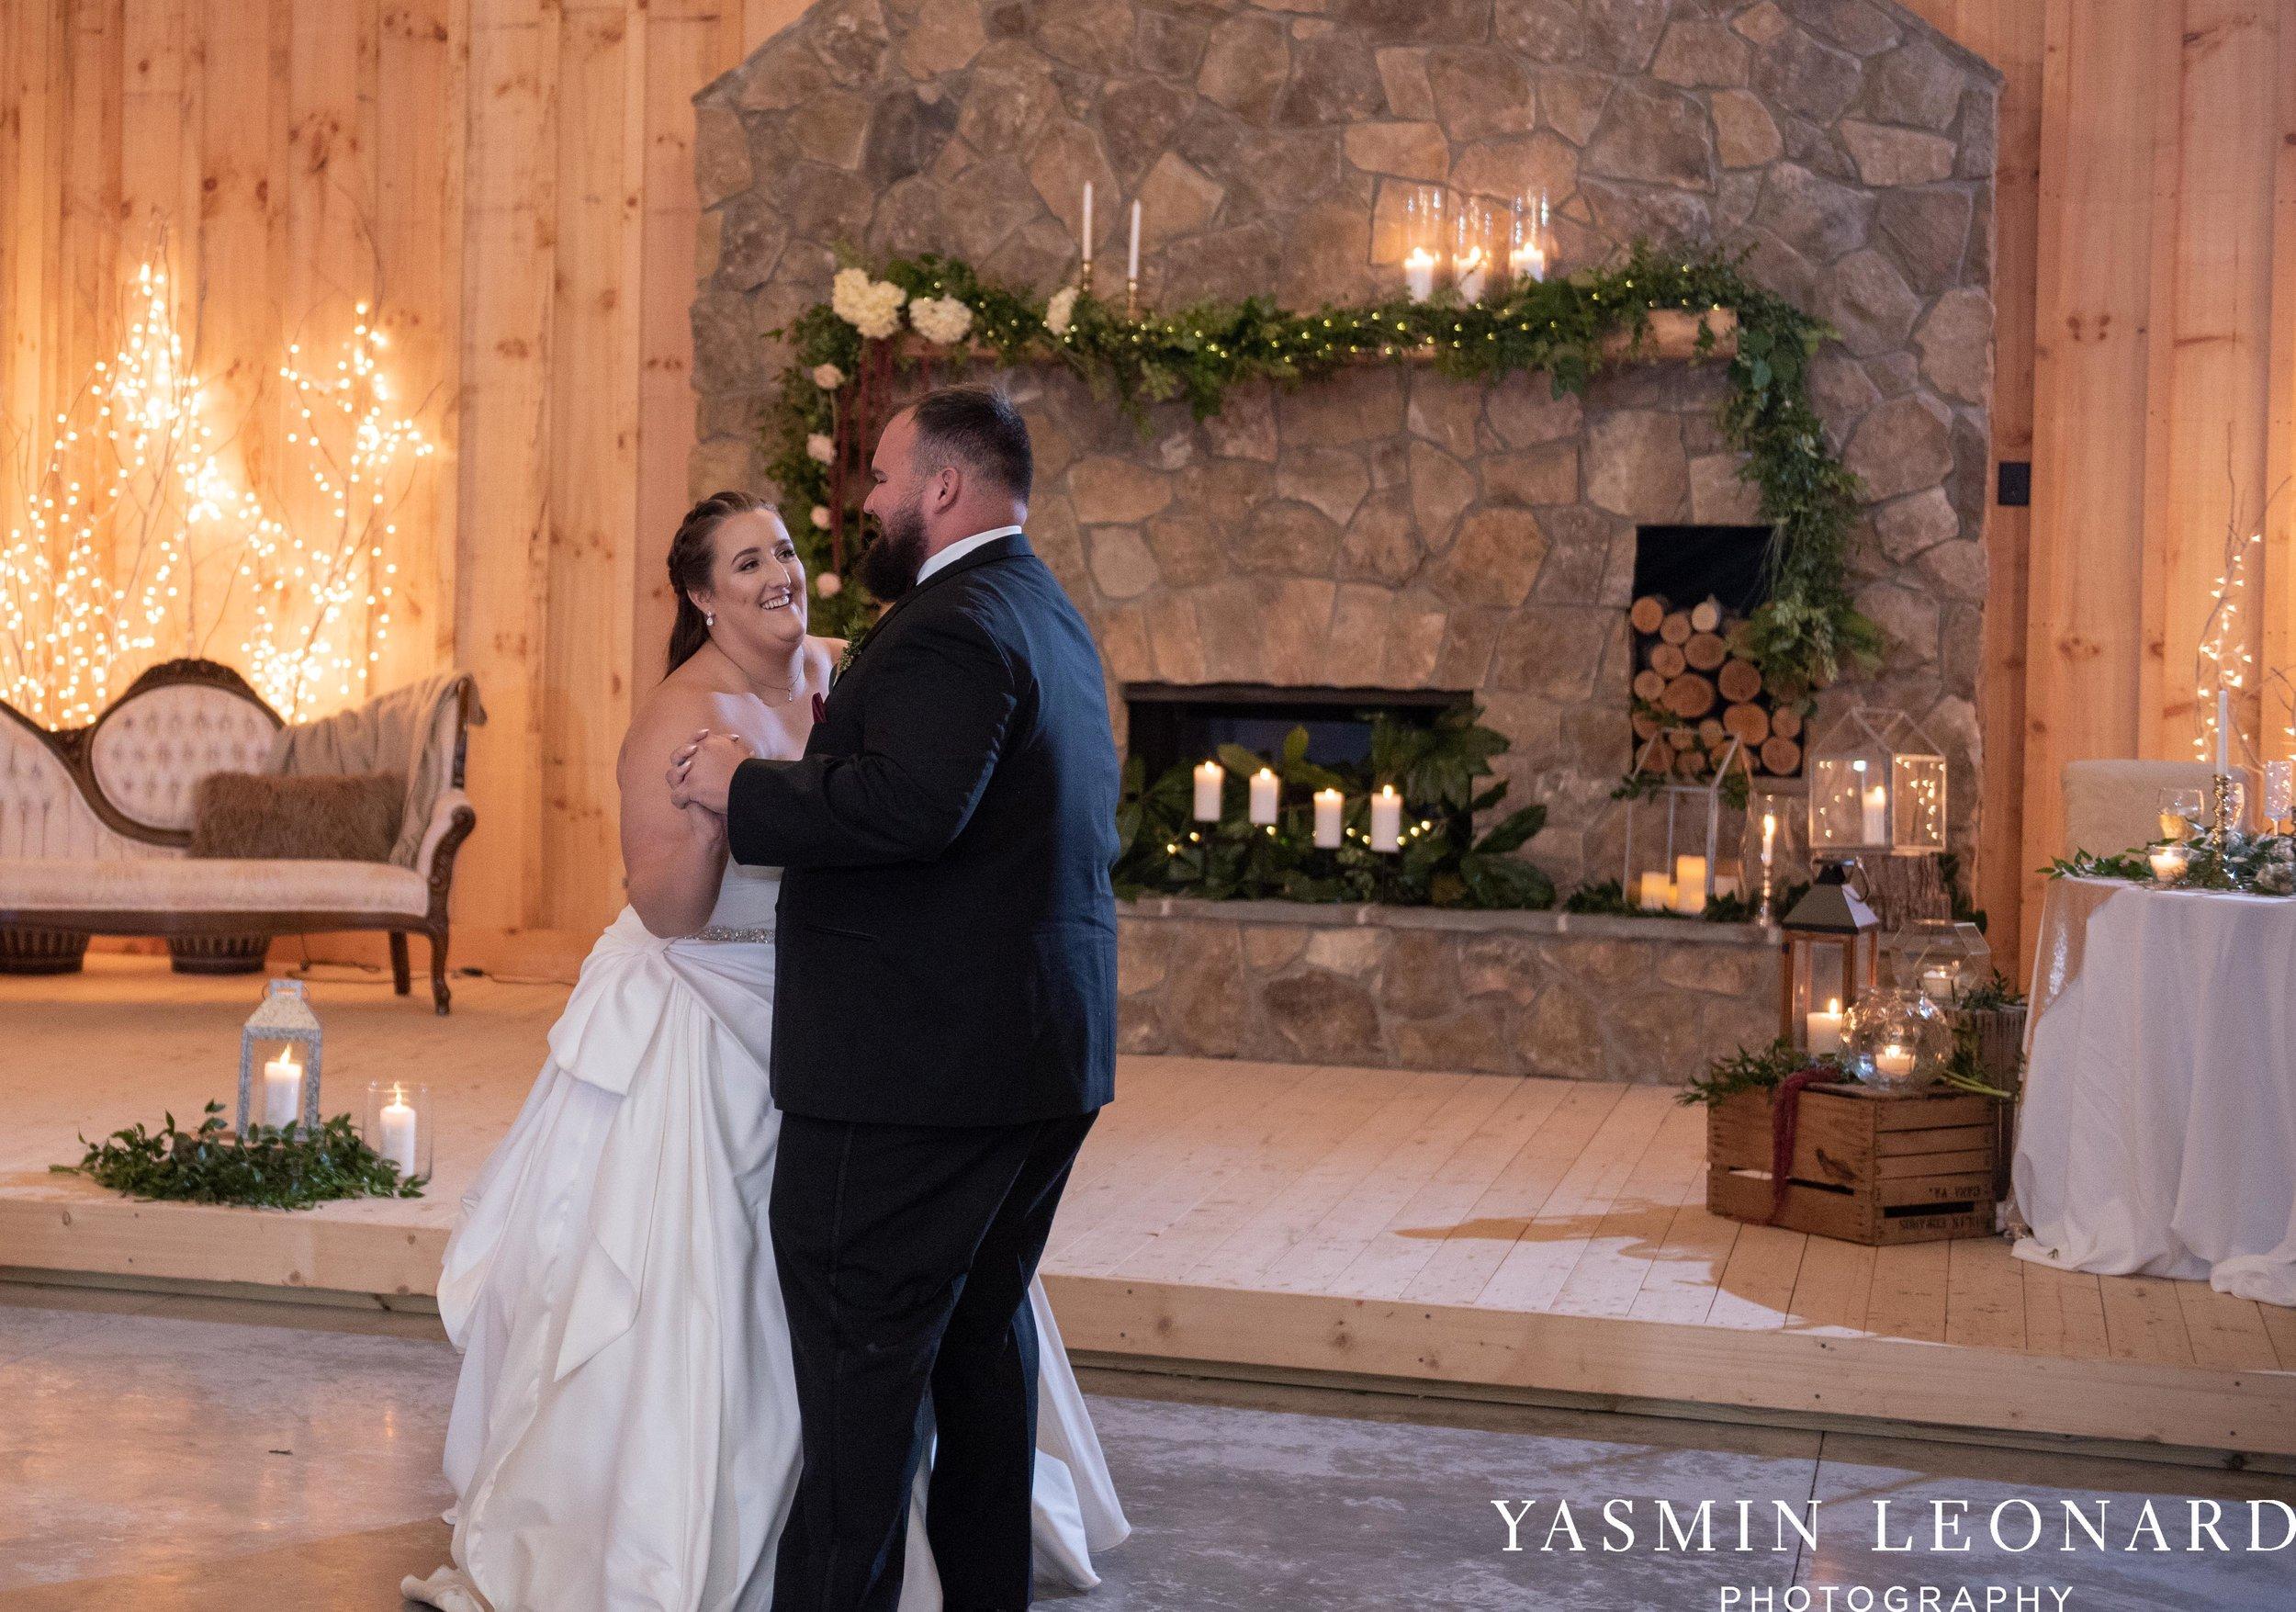 Wesley Memorial United Methodist Church - Old Homeplace Winery - High Point Weddings - High Point Wedding Photographer - NC Weddings - NC Barn Venue - Yasmin Leonard Photography-54.jpg